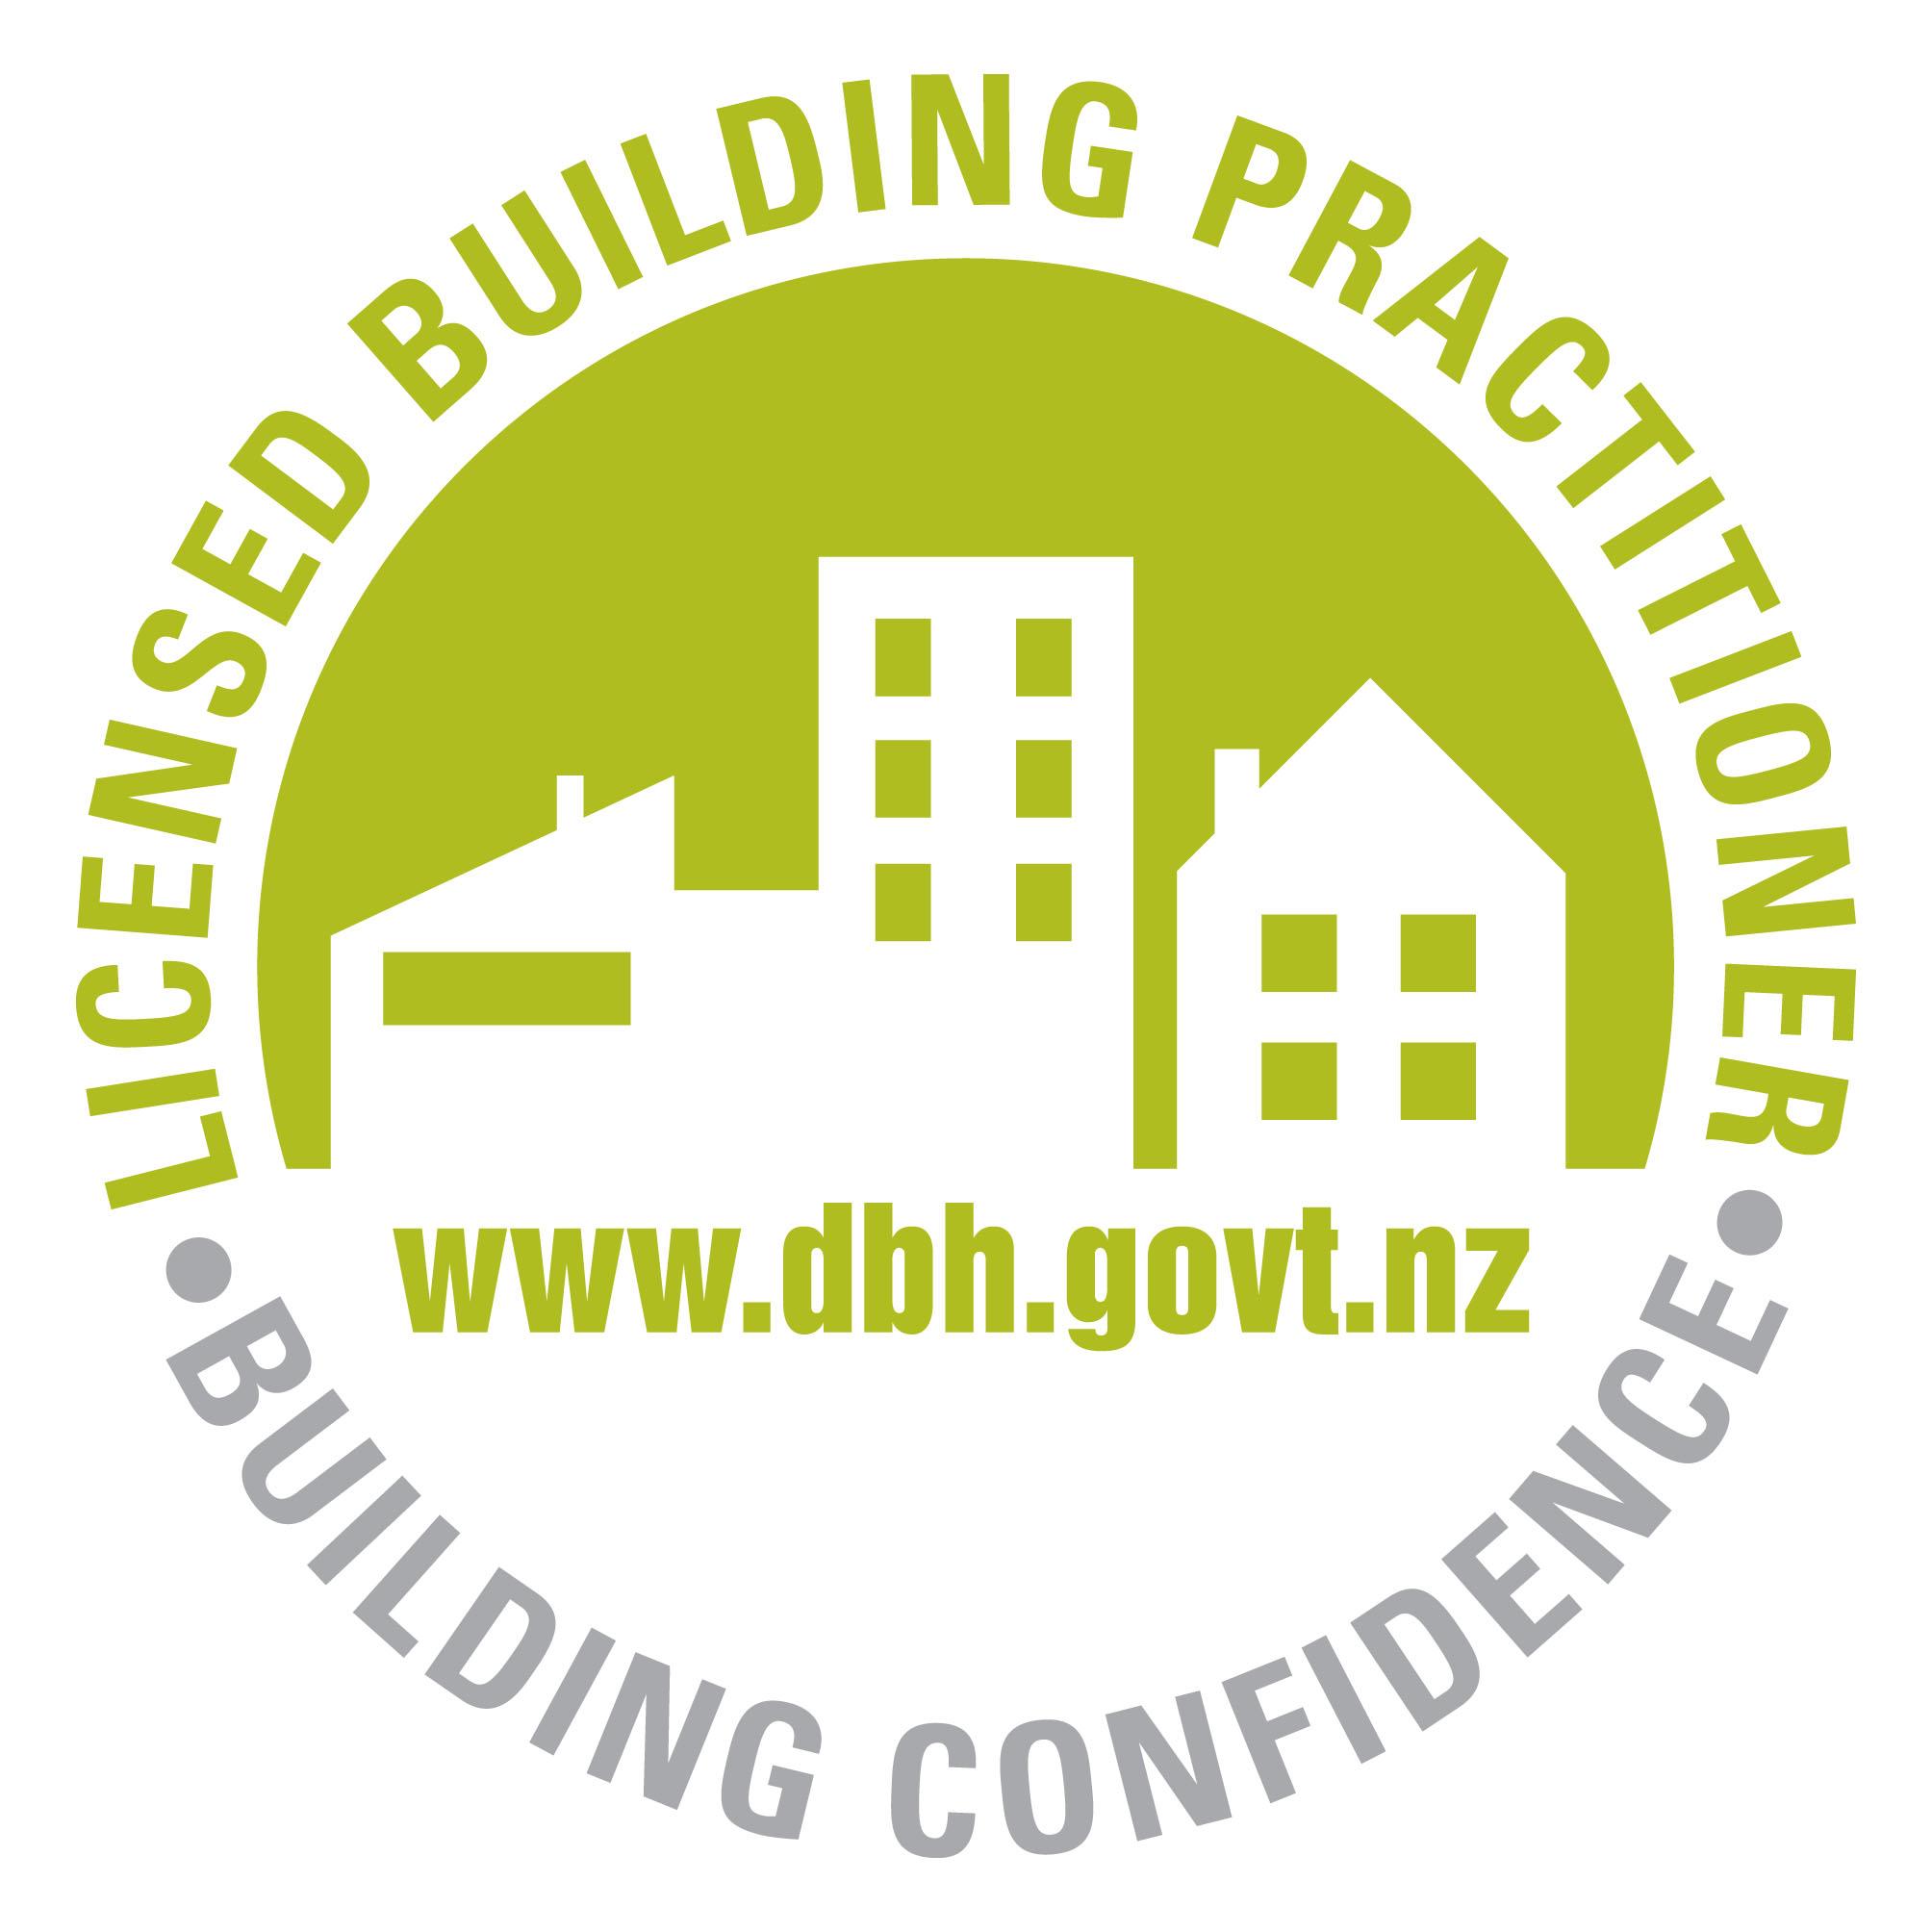 LBP-Logo-green-version.jpg